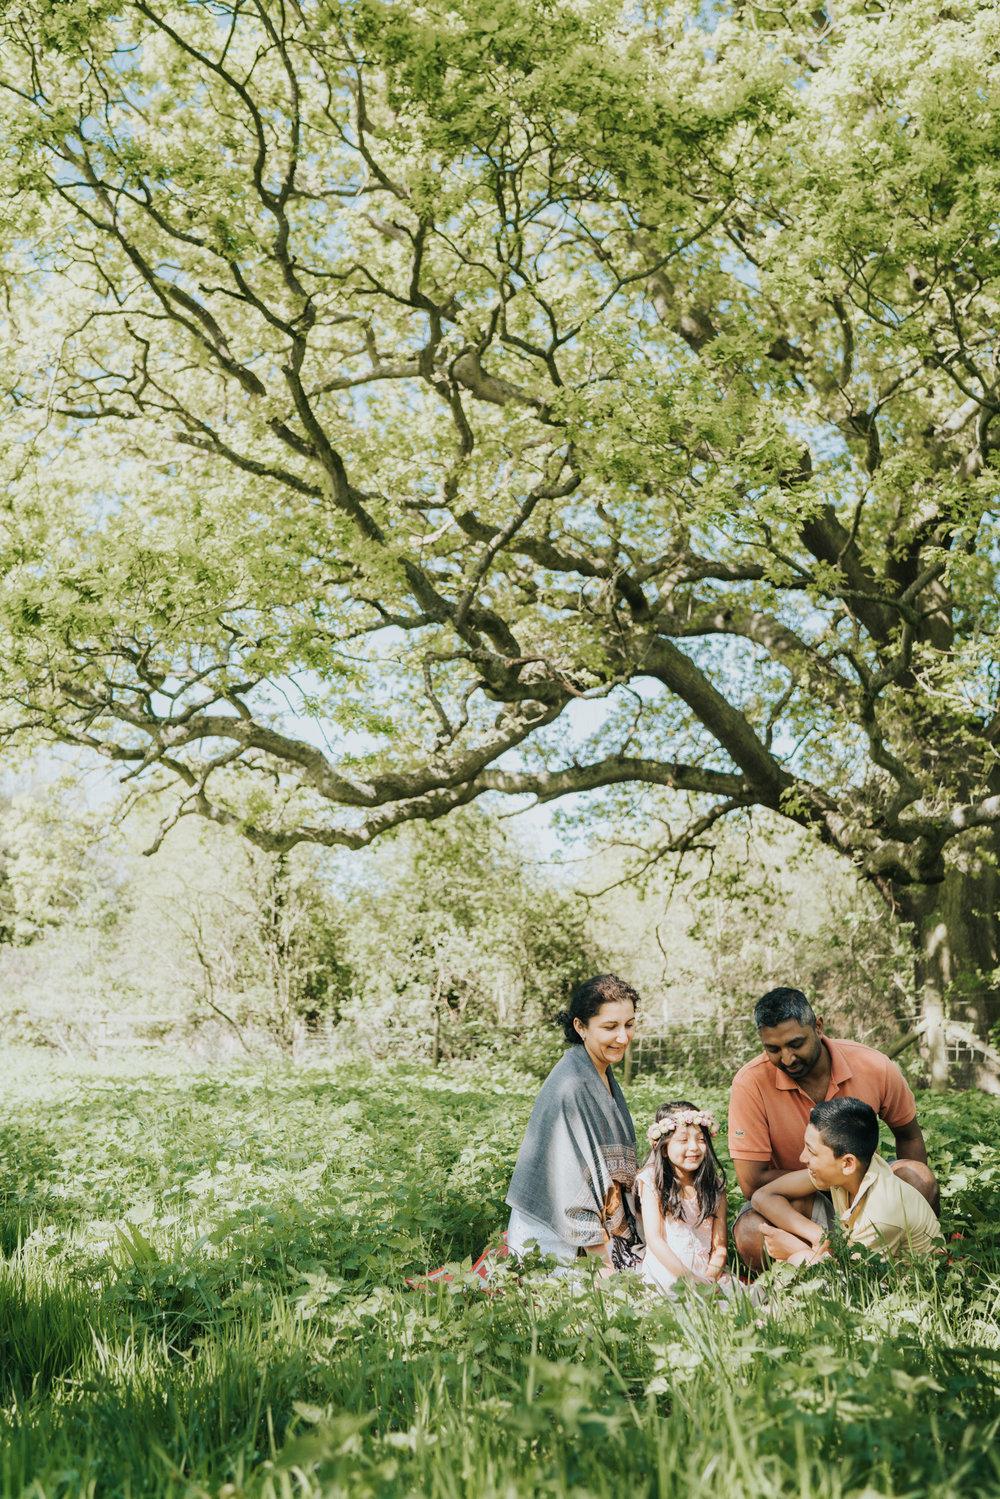 Chandrasiri-Family-Session-Woodland-Colchester-Essex-Grace-Elizabeth-Alternative-Wedding-Photographer (1 of 1).jpg (20 of 34).jpg